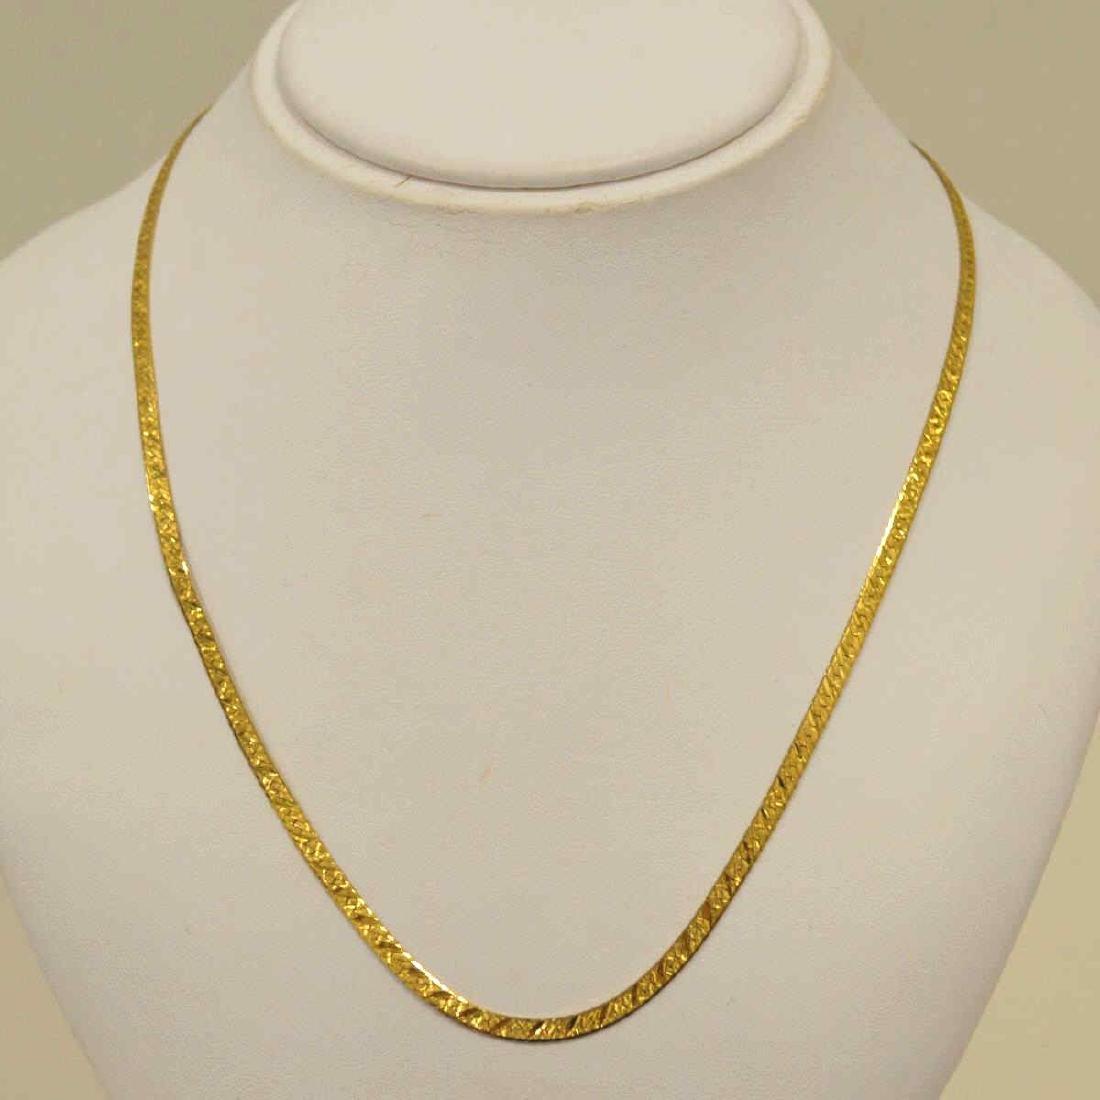 14kt yellow gold herringbone necklace